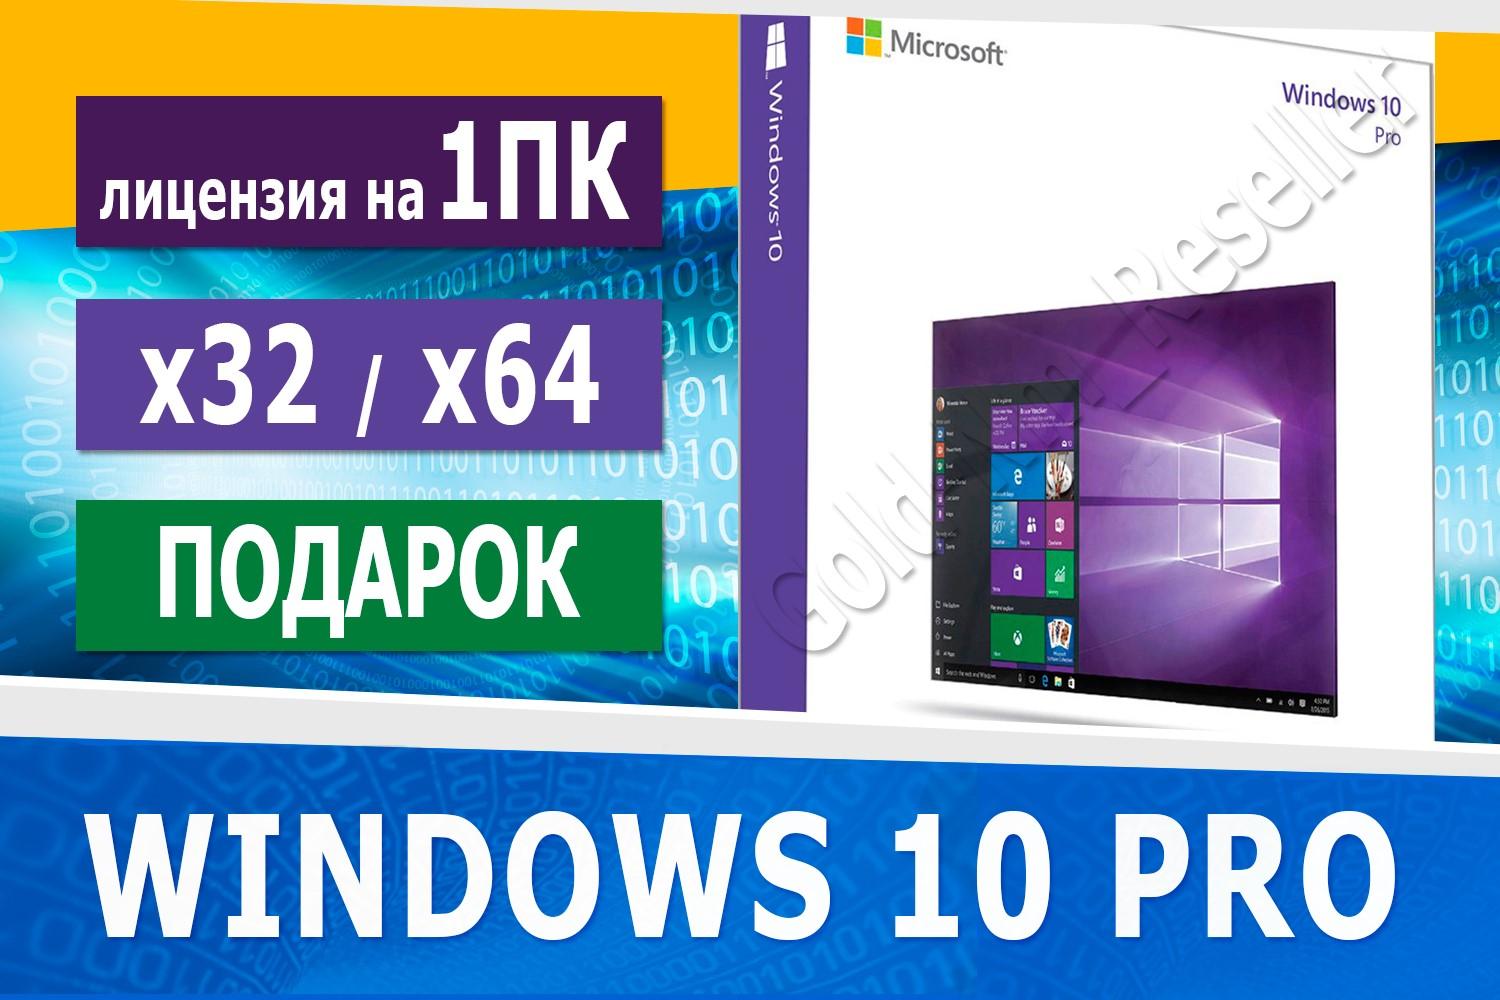 WINDOWS 10 PRO 32/64 bit  [Полная версия] 1PC + ISO